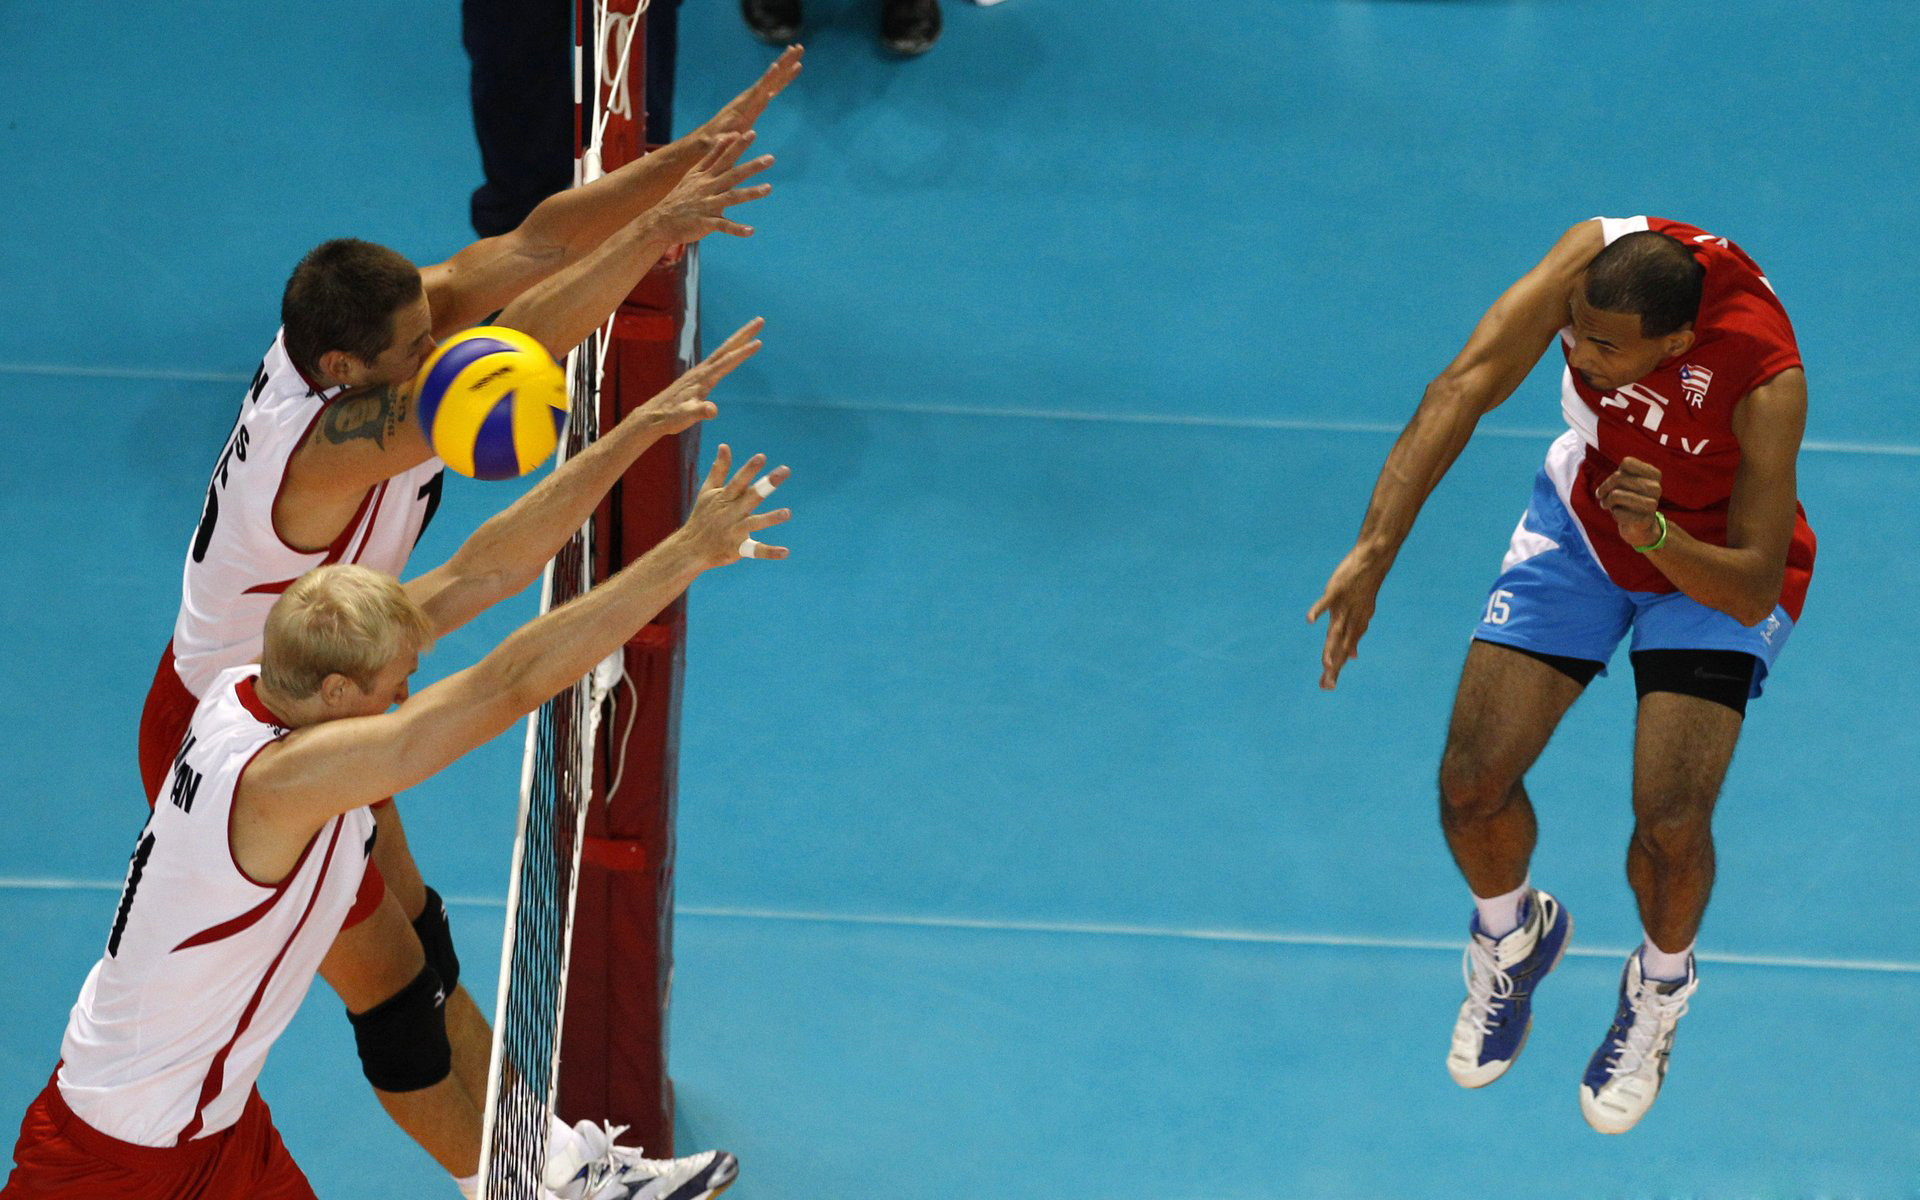 Free Wallpaper Backgrounds For Fall Volleyball Backgrounds Pixelstalk Net